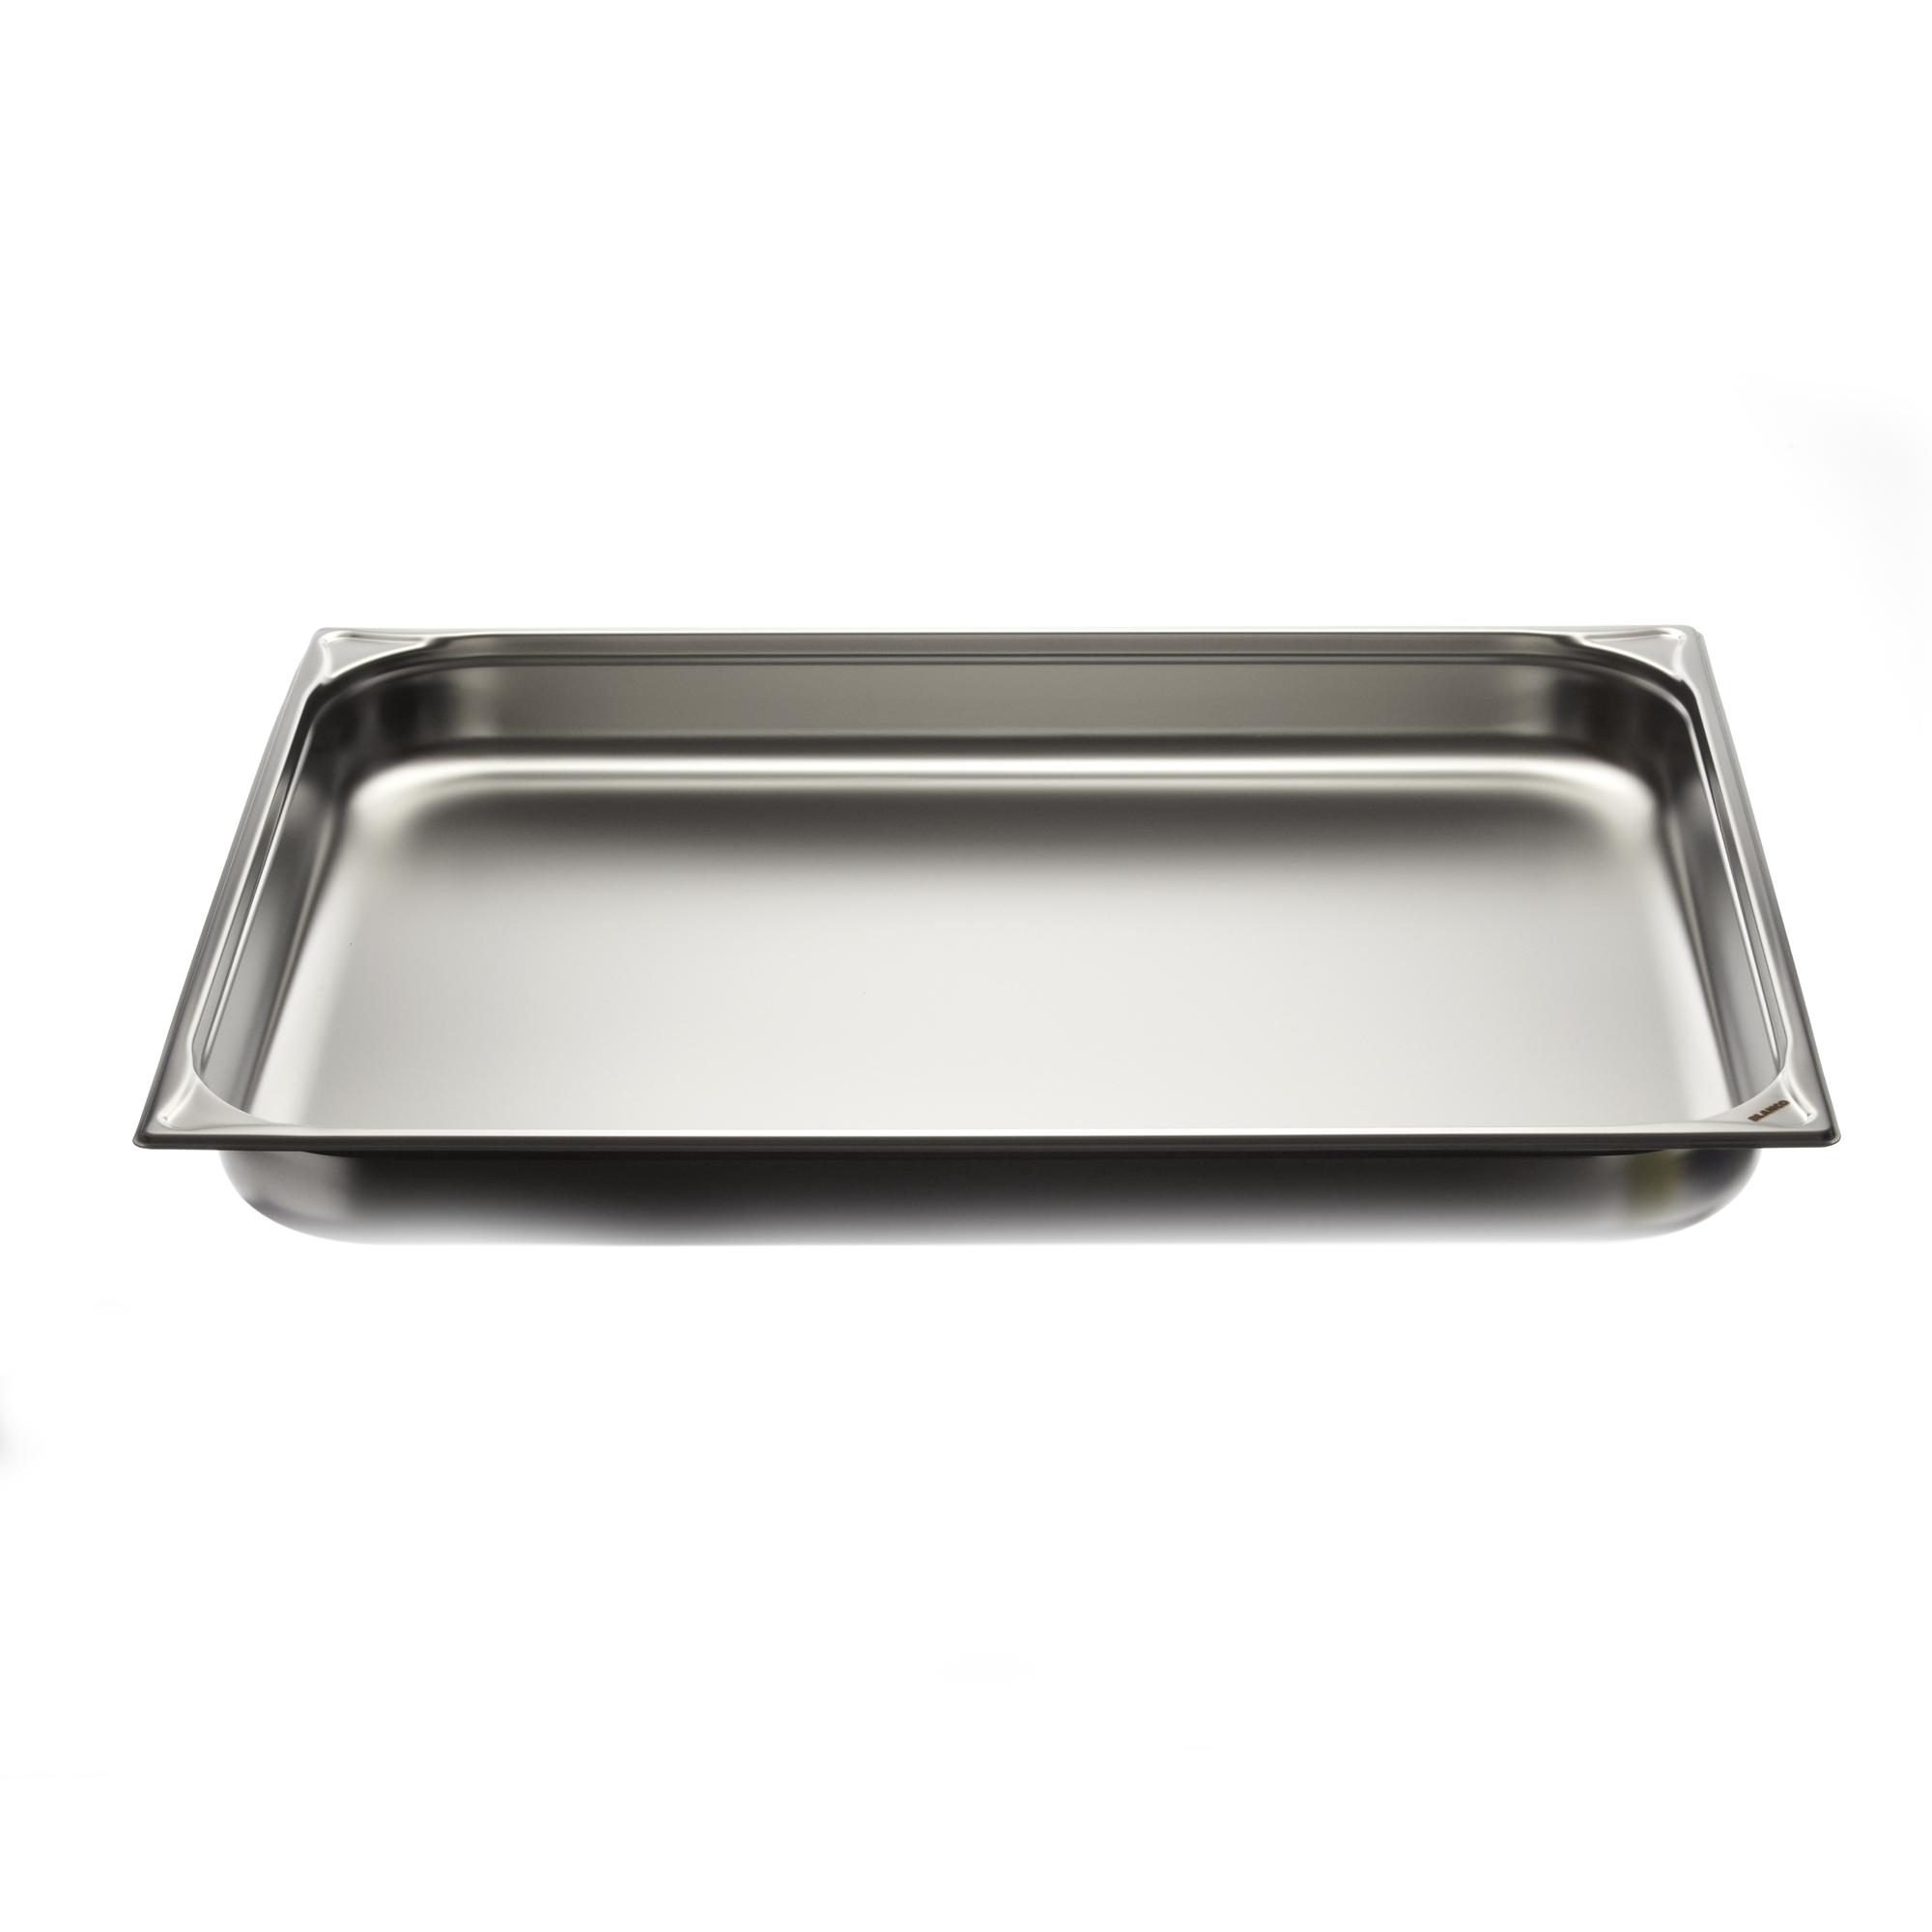 Couvercle de bac plat inox premium gn 2 1 mjpro for Bac cuisine inox